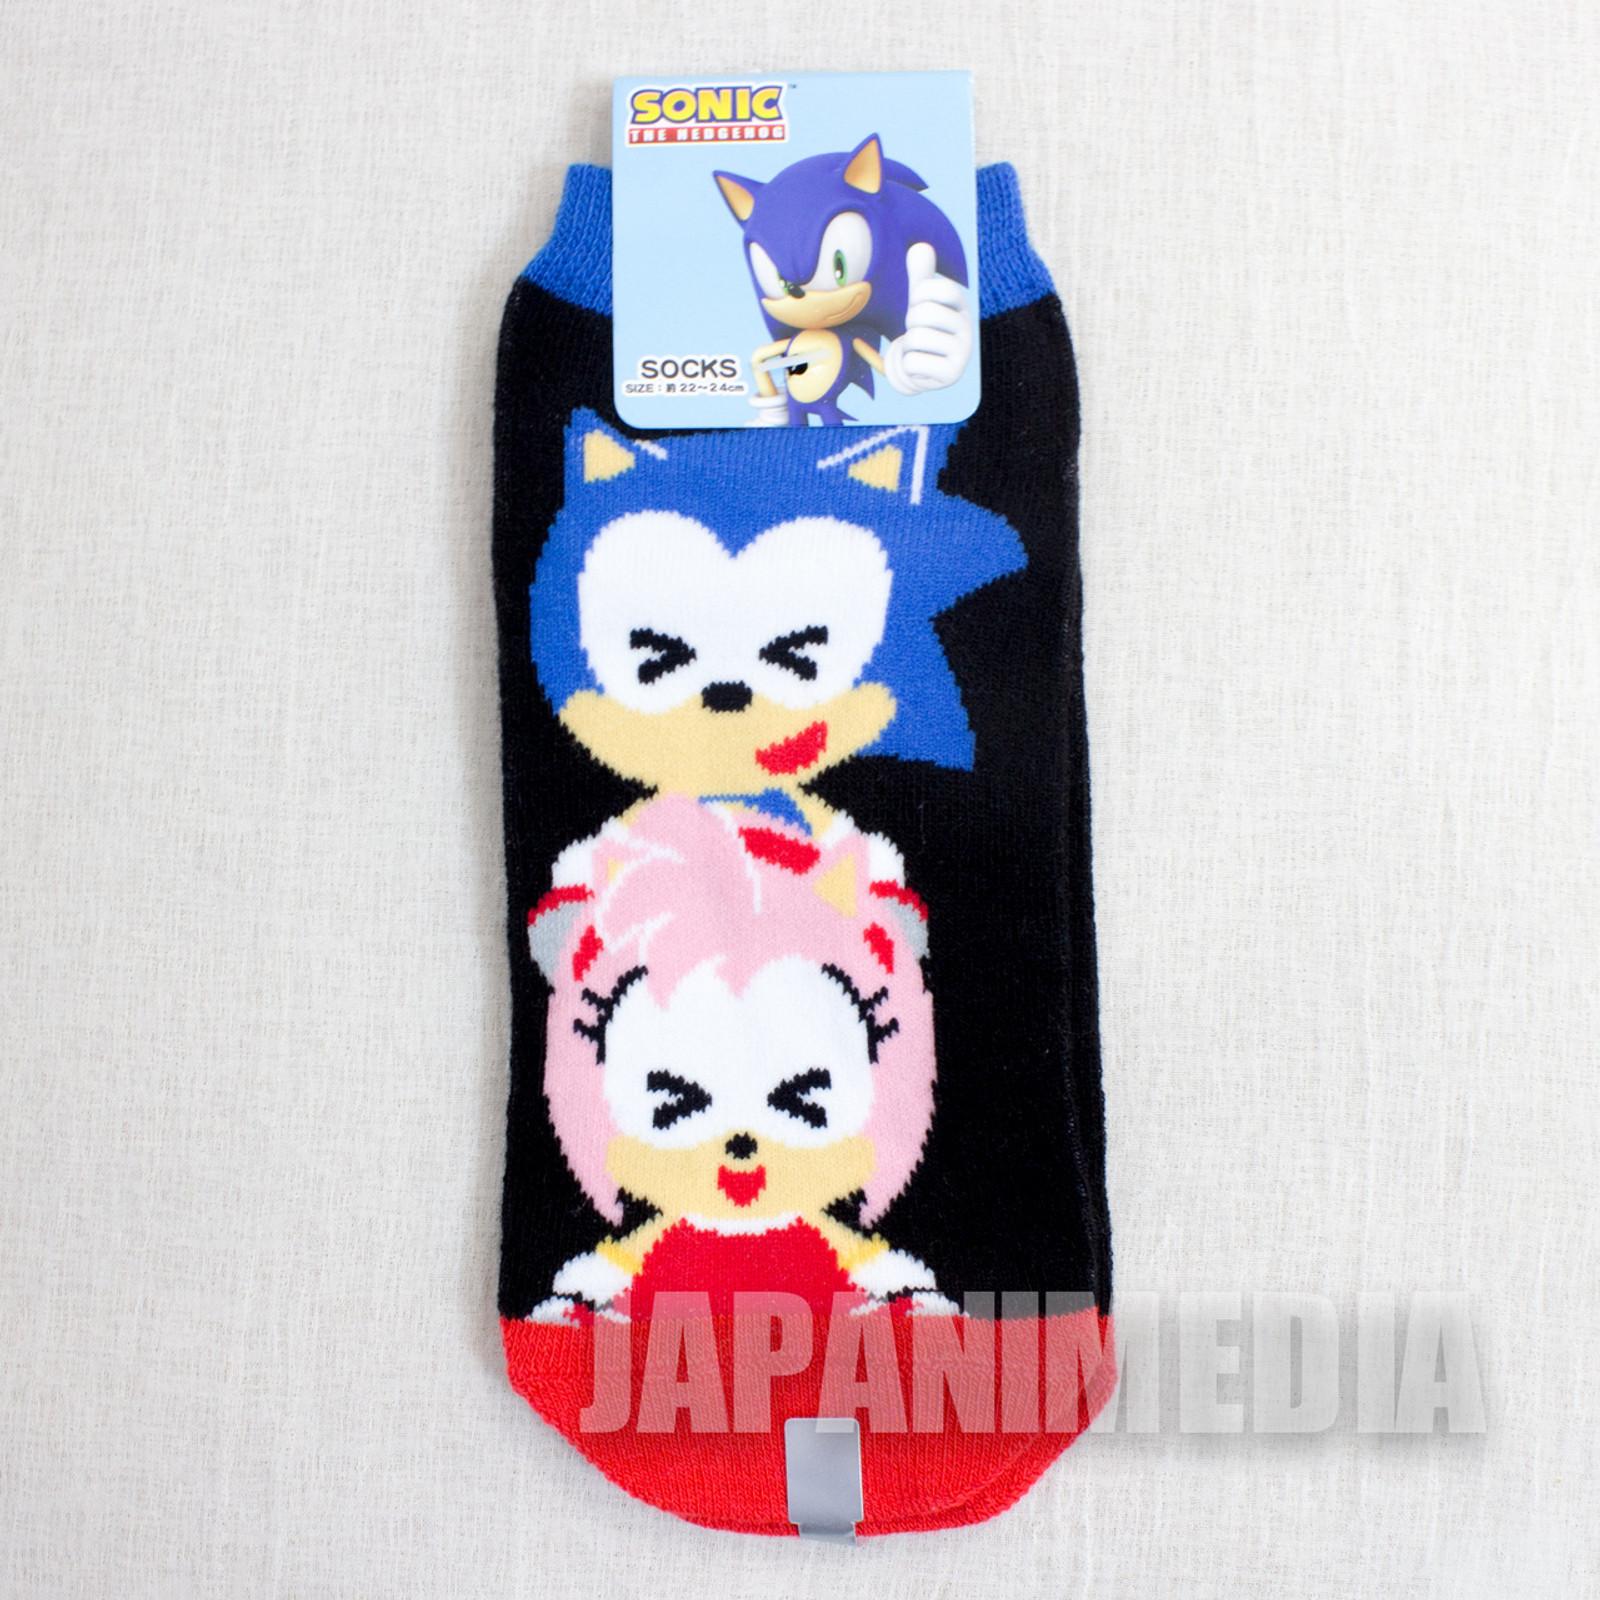 Sonic The Hedgehog #2 a Pair of Socks Size 22-24cm JAPAN ANIME MANGA